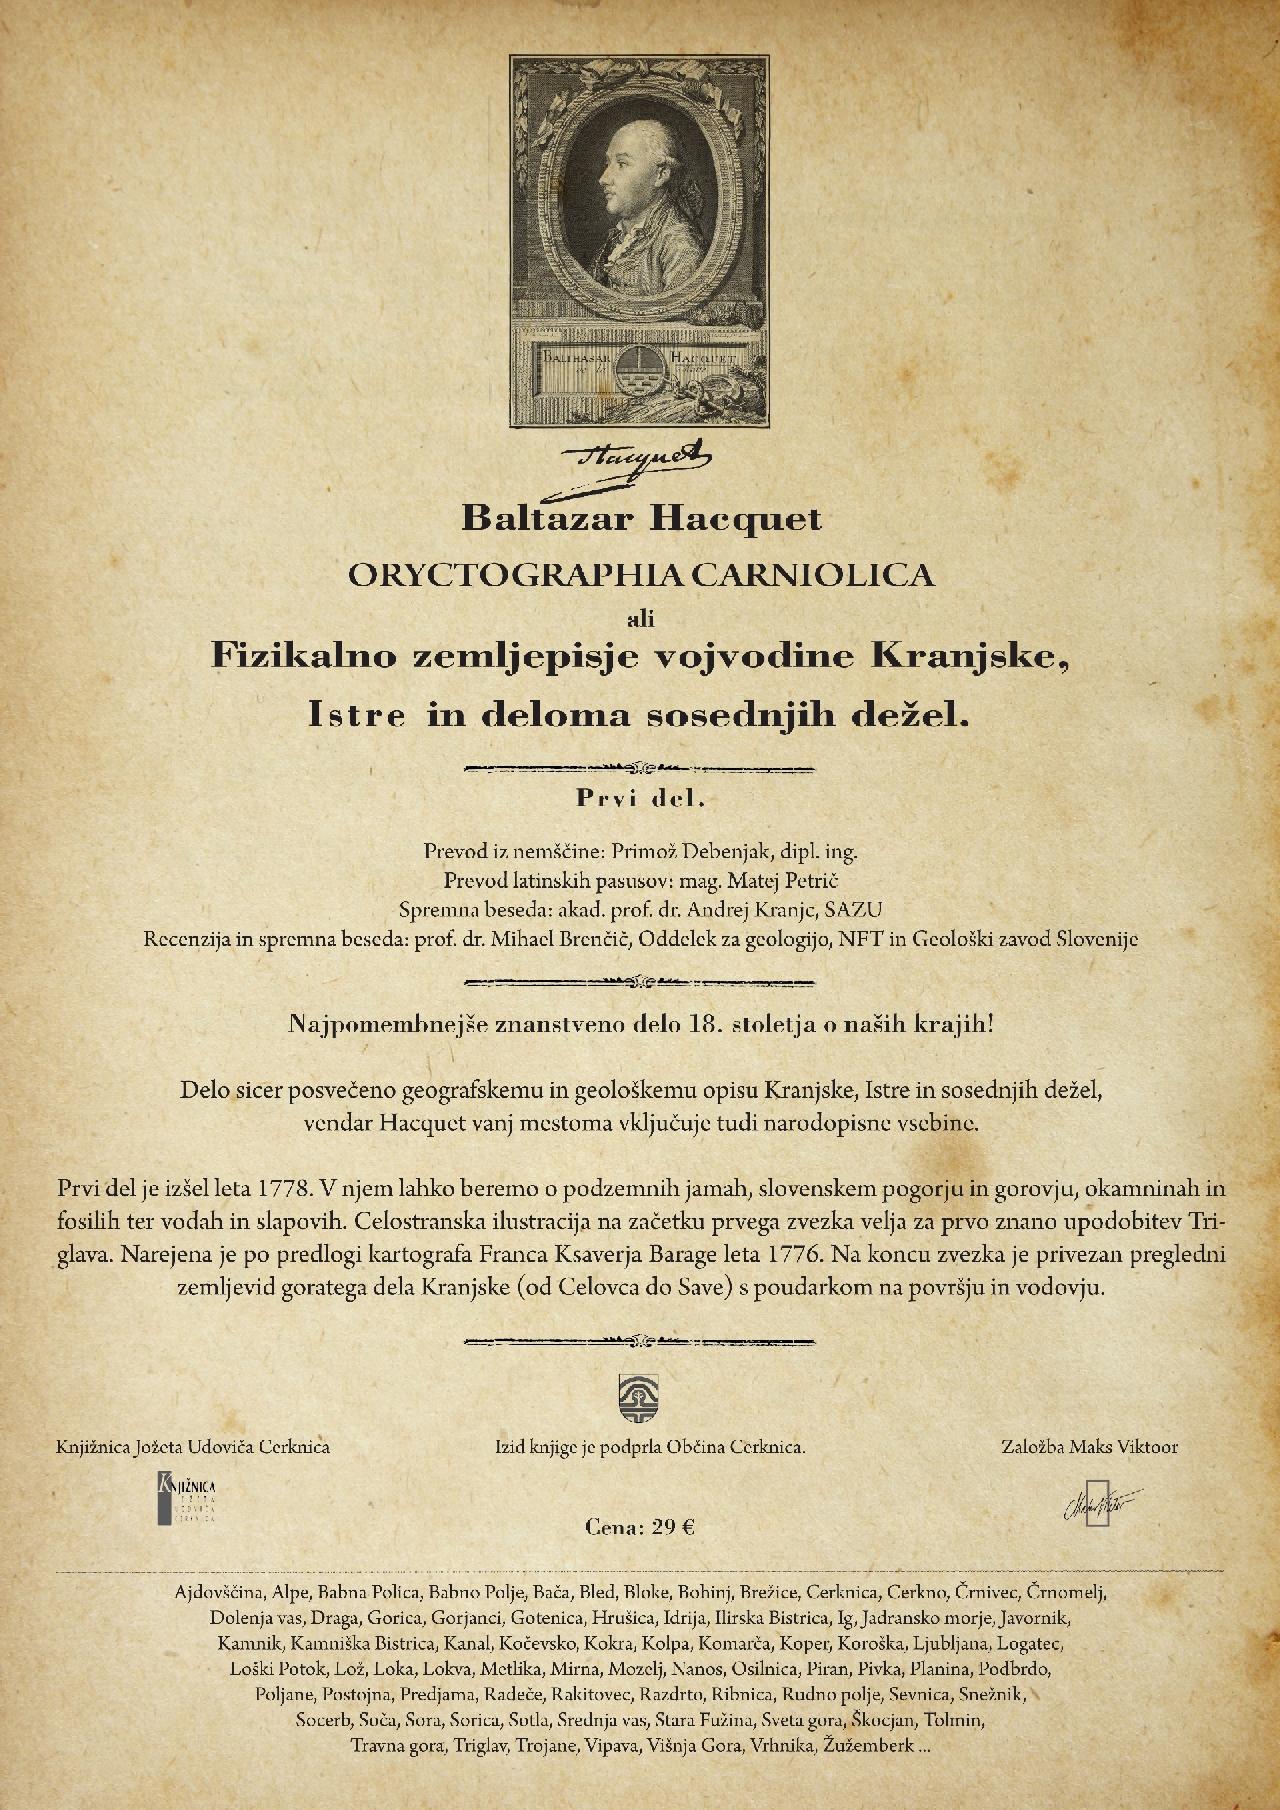 Baltazar Hacquet vel1 - Baltazar Hacquet - Oryctographia Carniolica / Oriktografija Kranjske